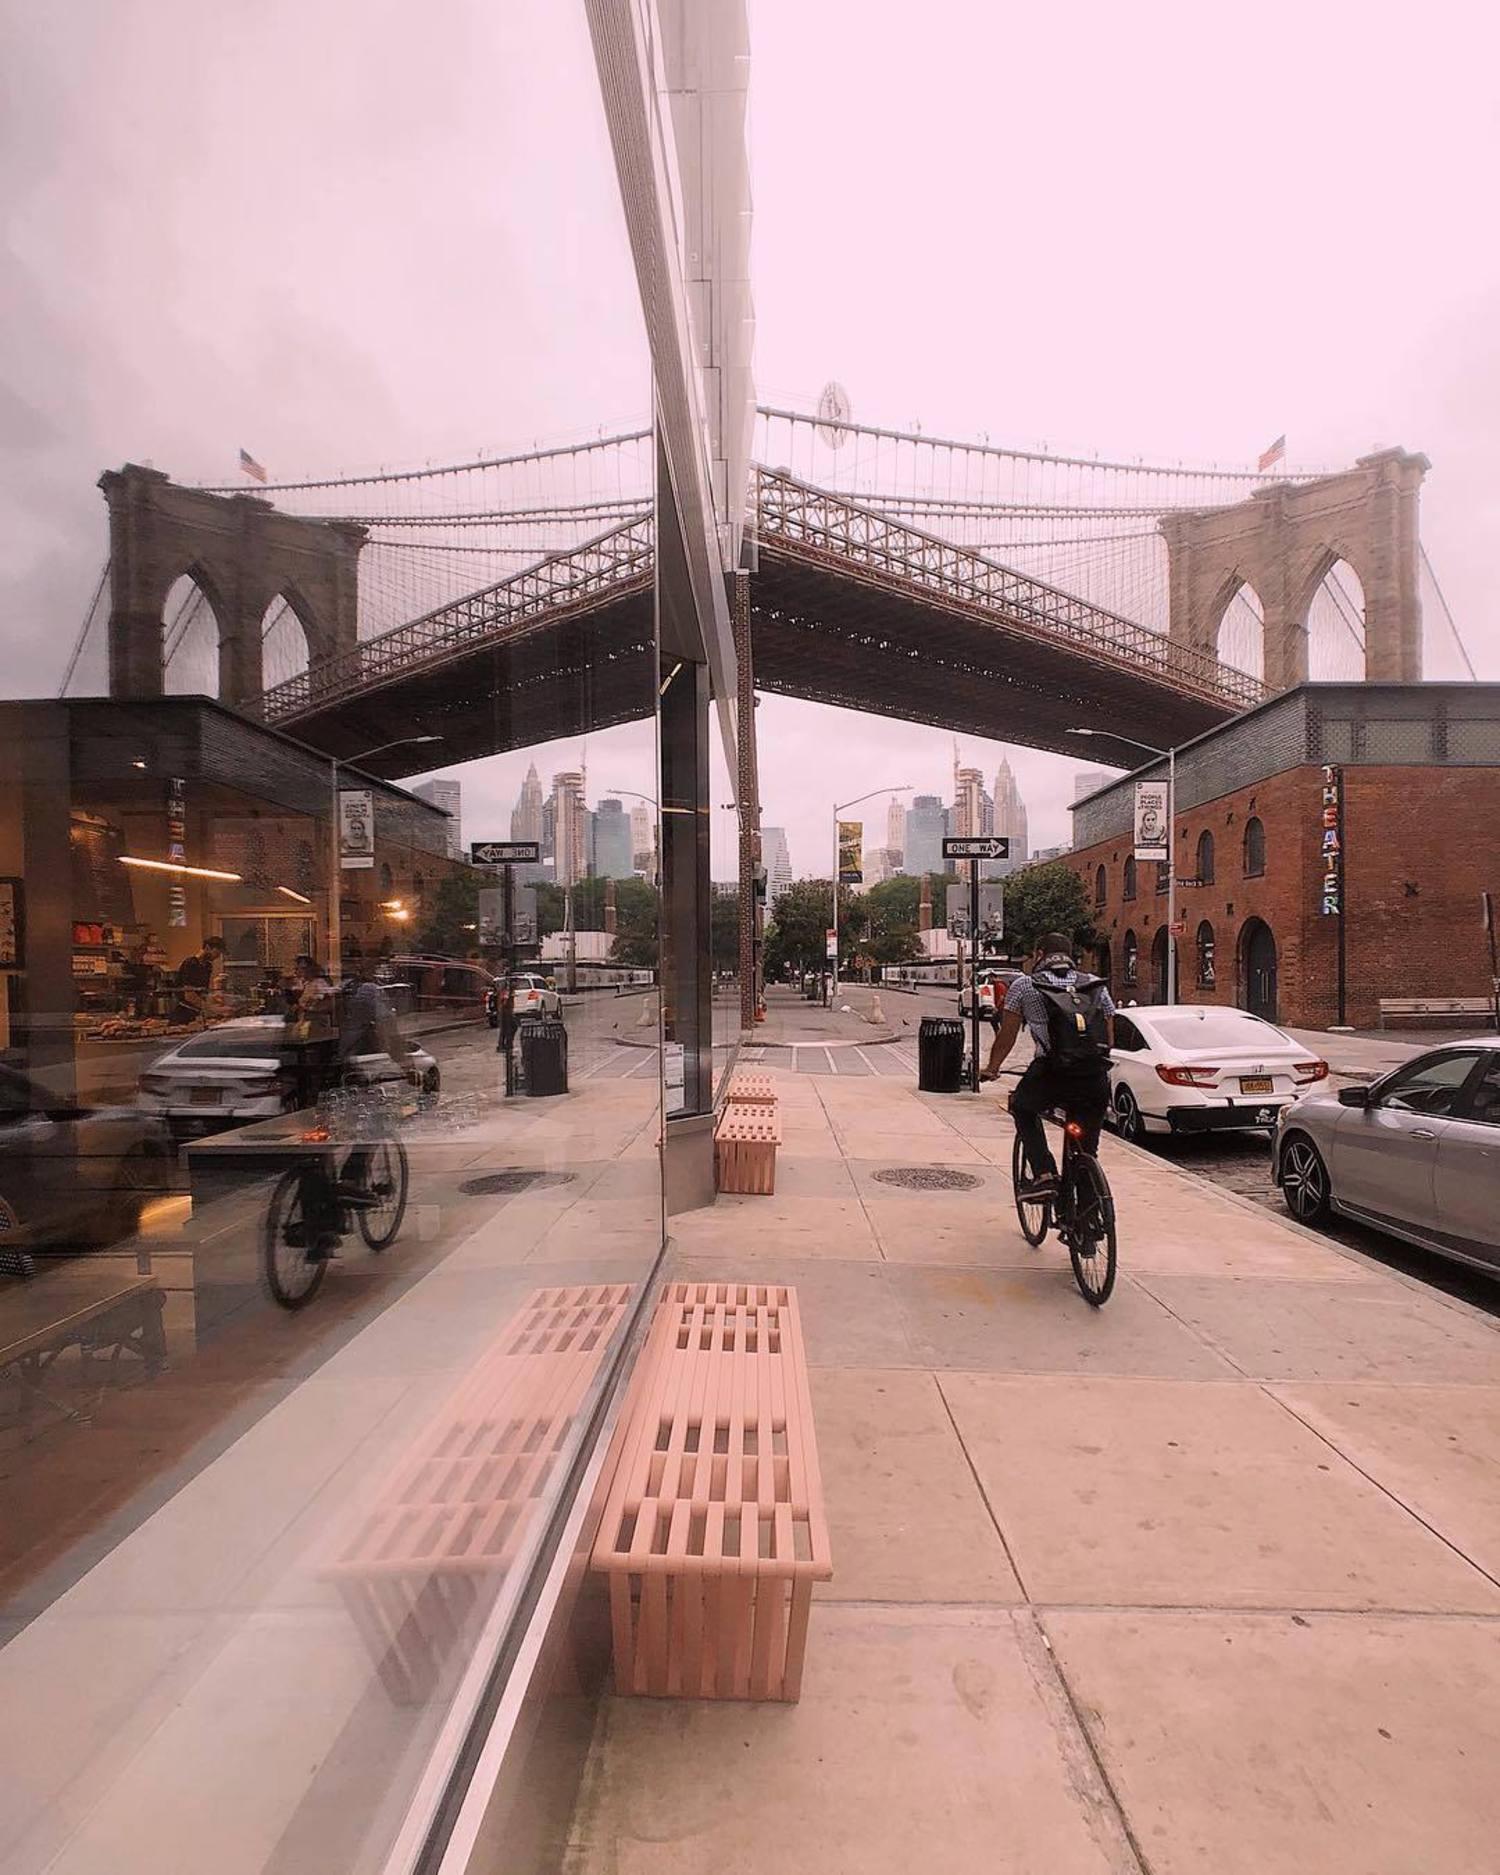 Water Street, DUMBO, Brooklyn